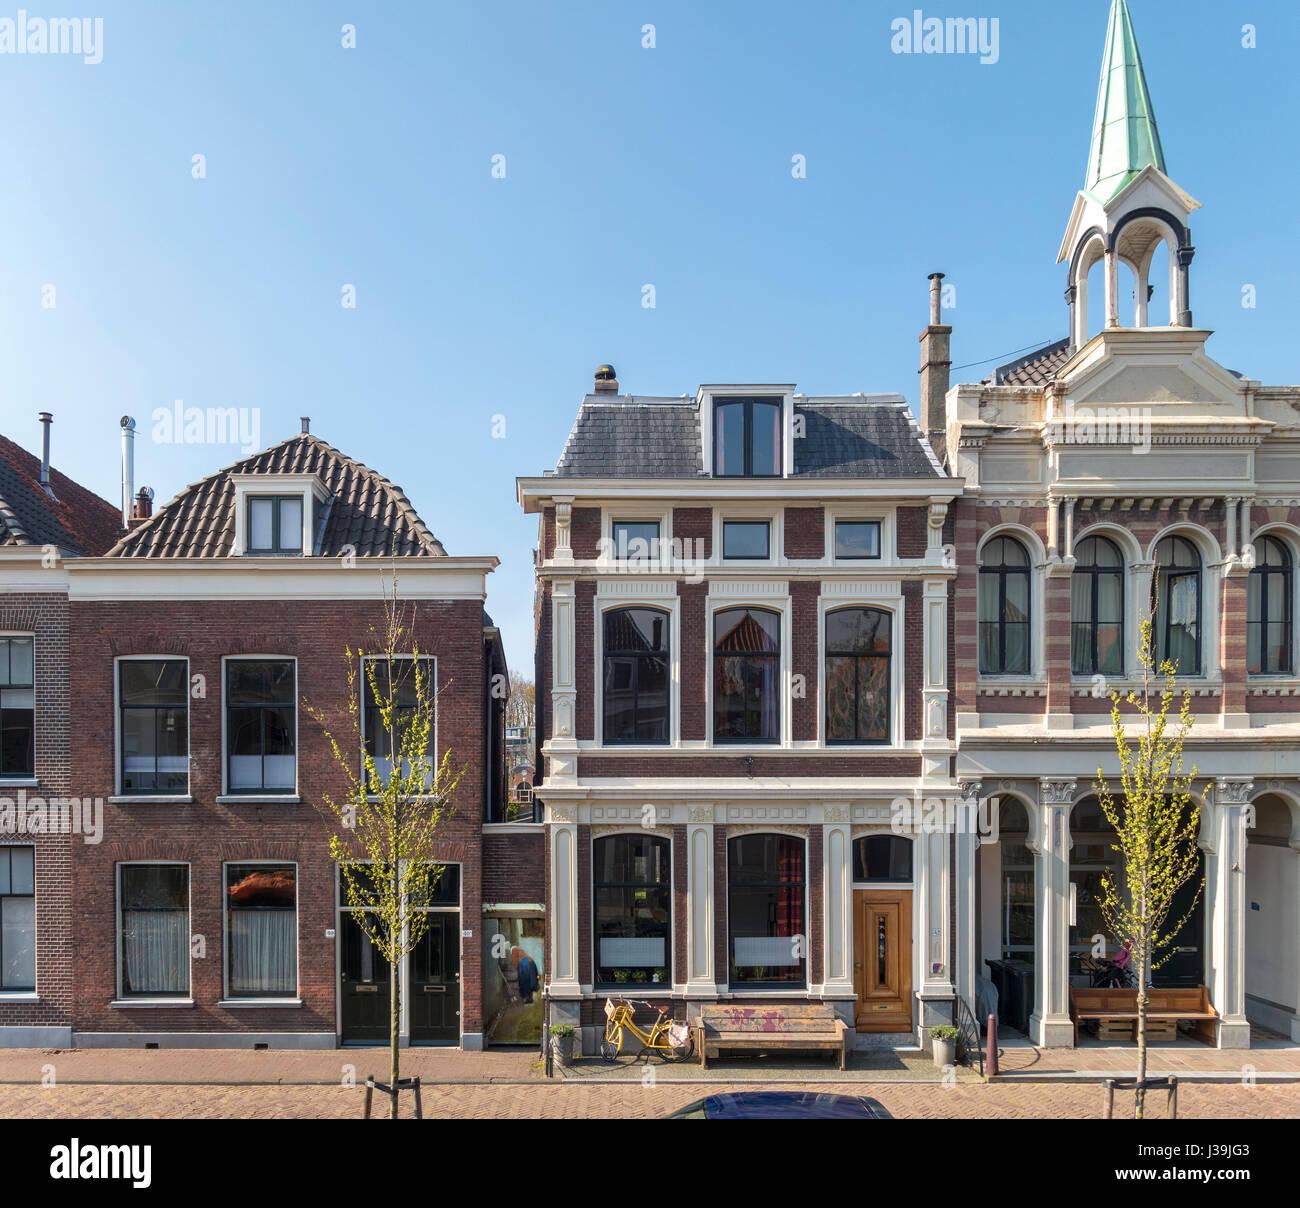 Vermeer de Delft La petite rue. Vlamingstraat 40 et 42 l'emplacement exact de la petite rue par Johannes Vermeer Photo Stock